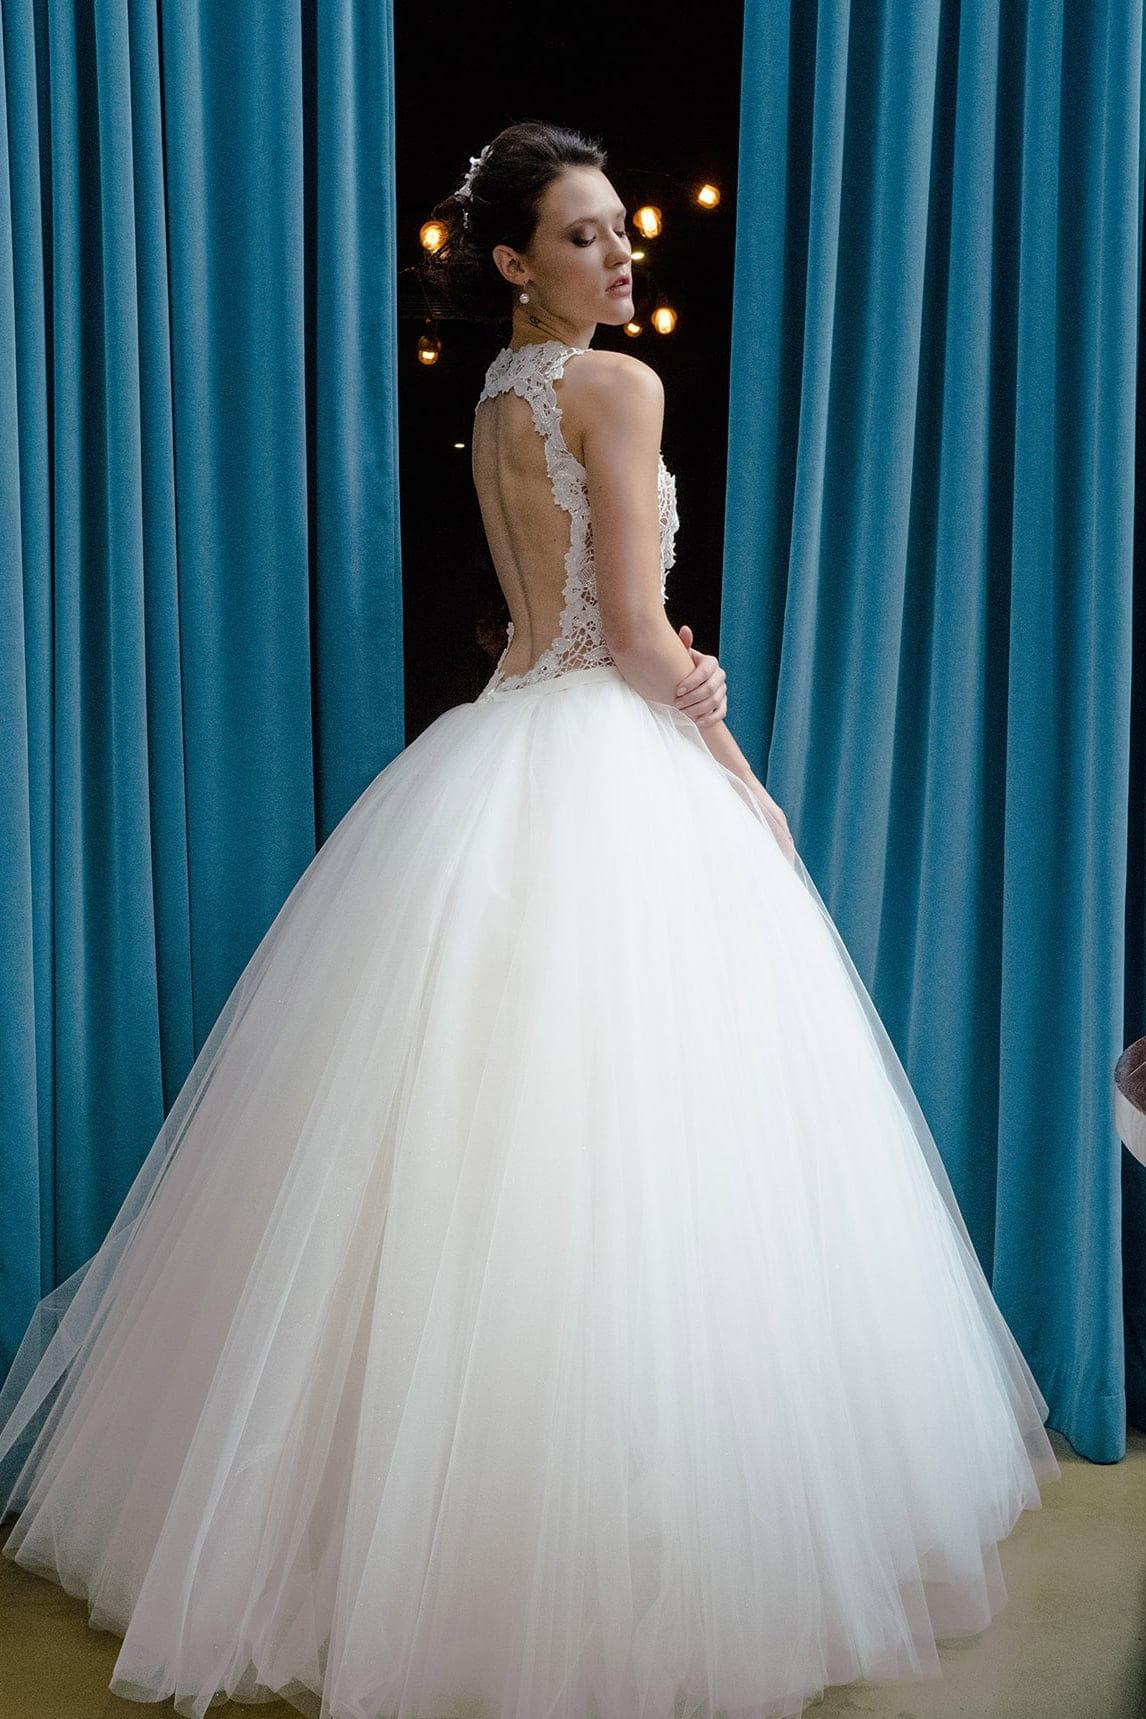 Robe de mariée Bahamas, Max Chaoul